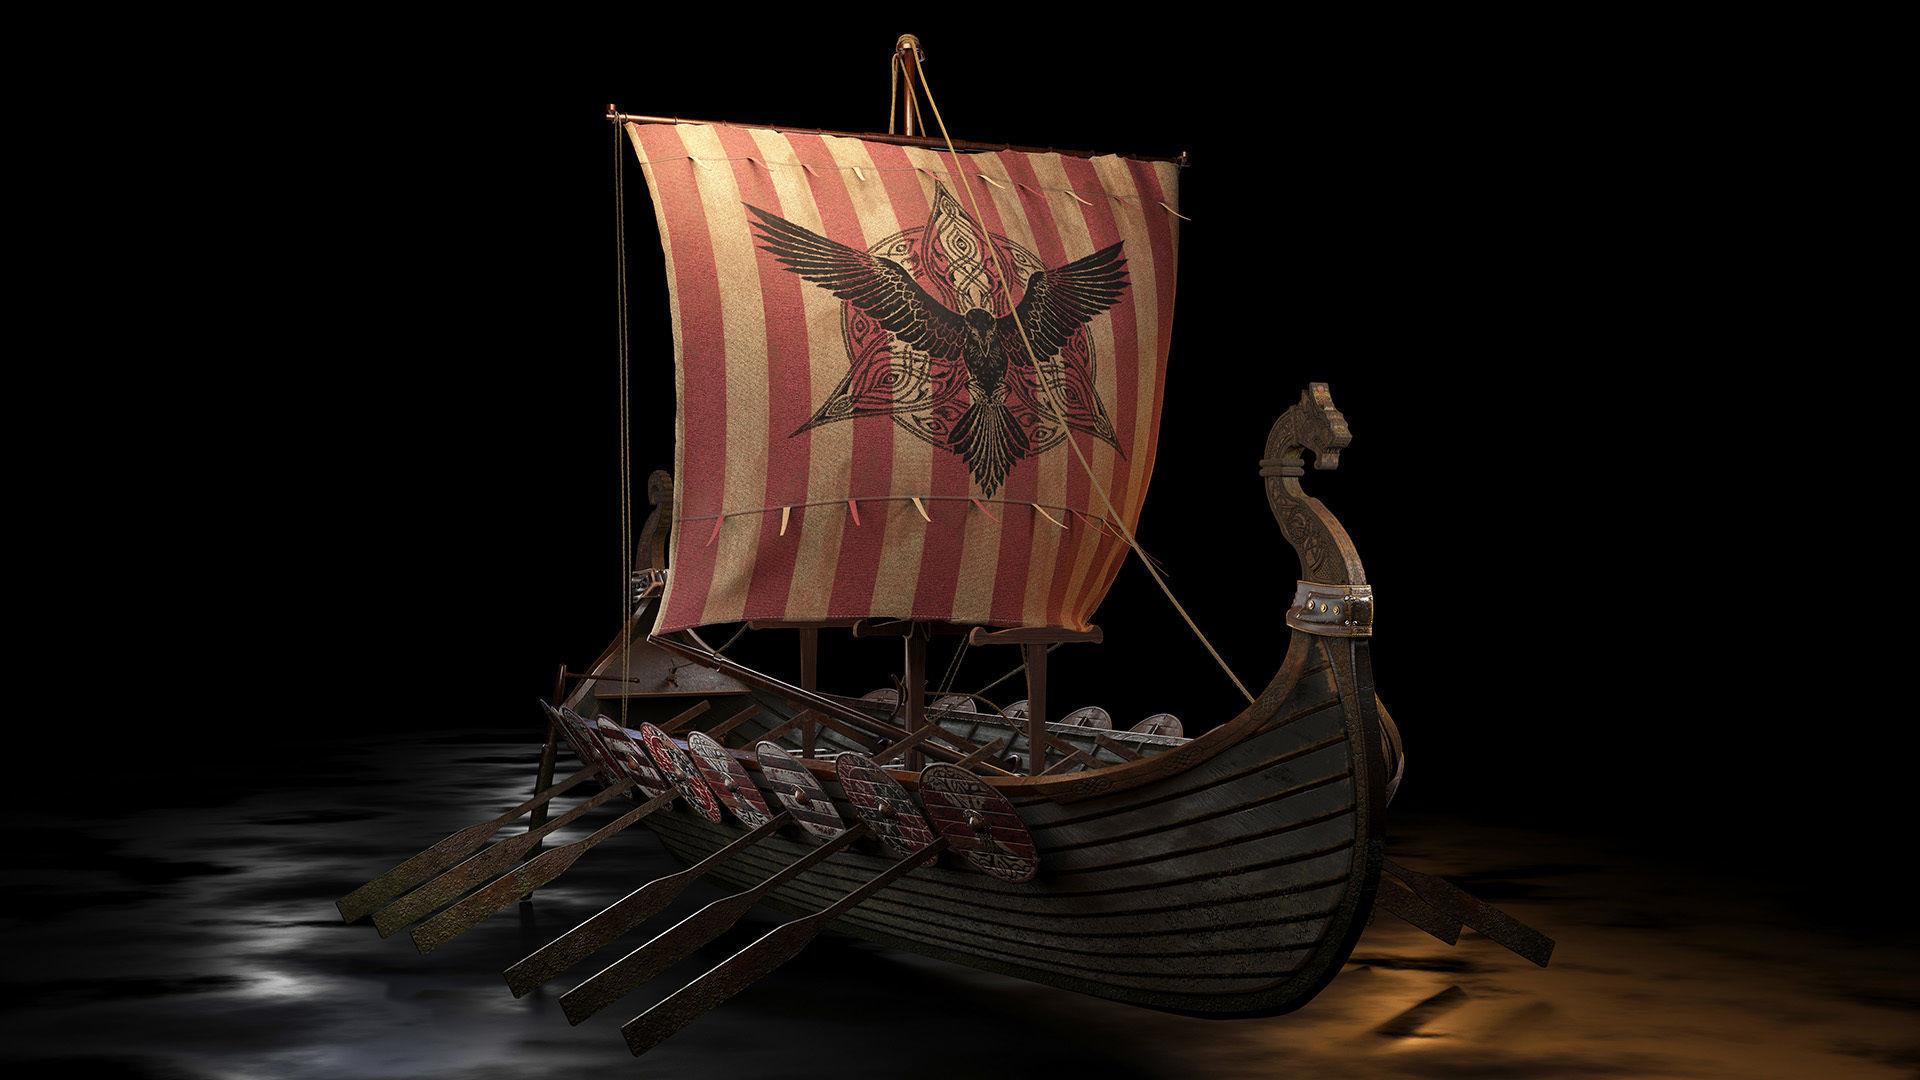 Viking boat - viking ship- longship